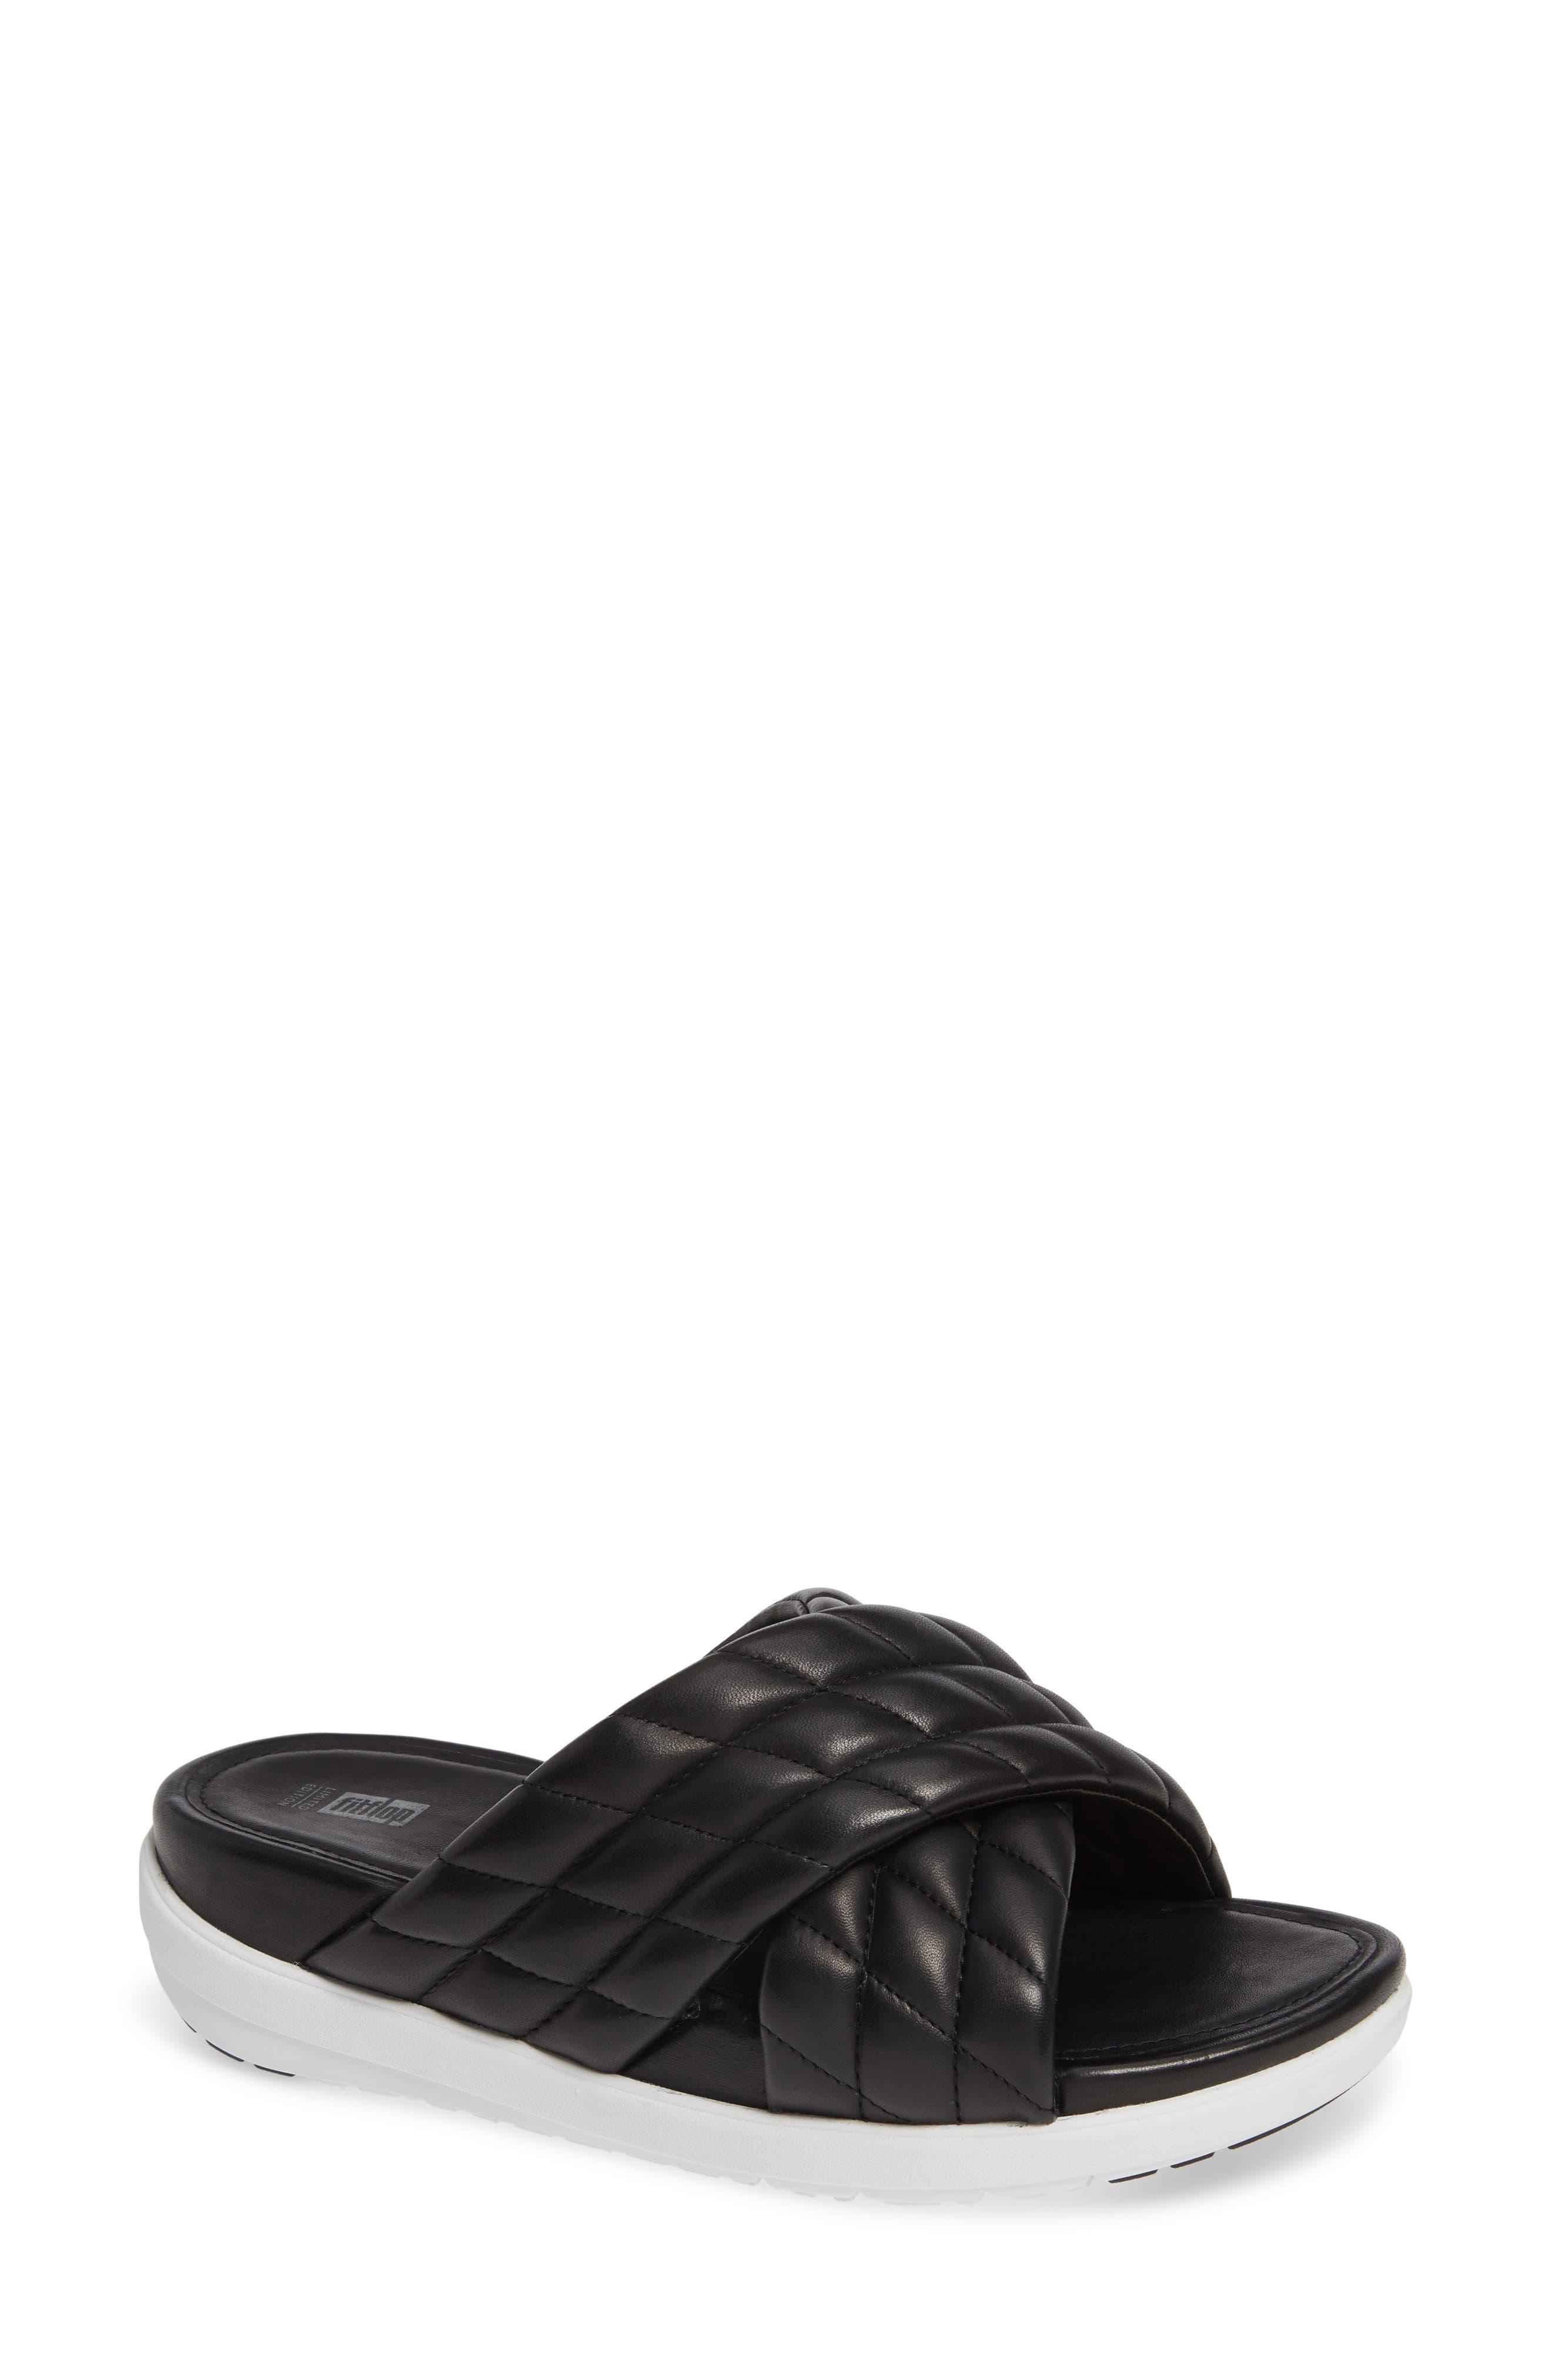 Fitflop Loosh Luxe Slide Sandal, Black